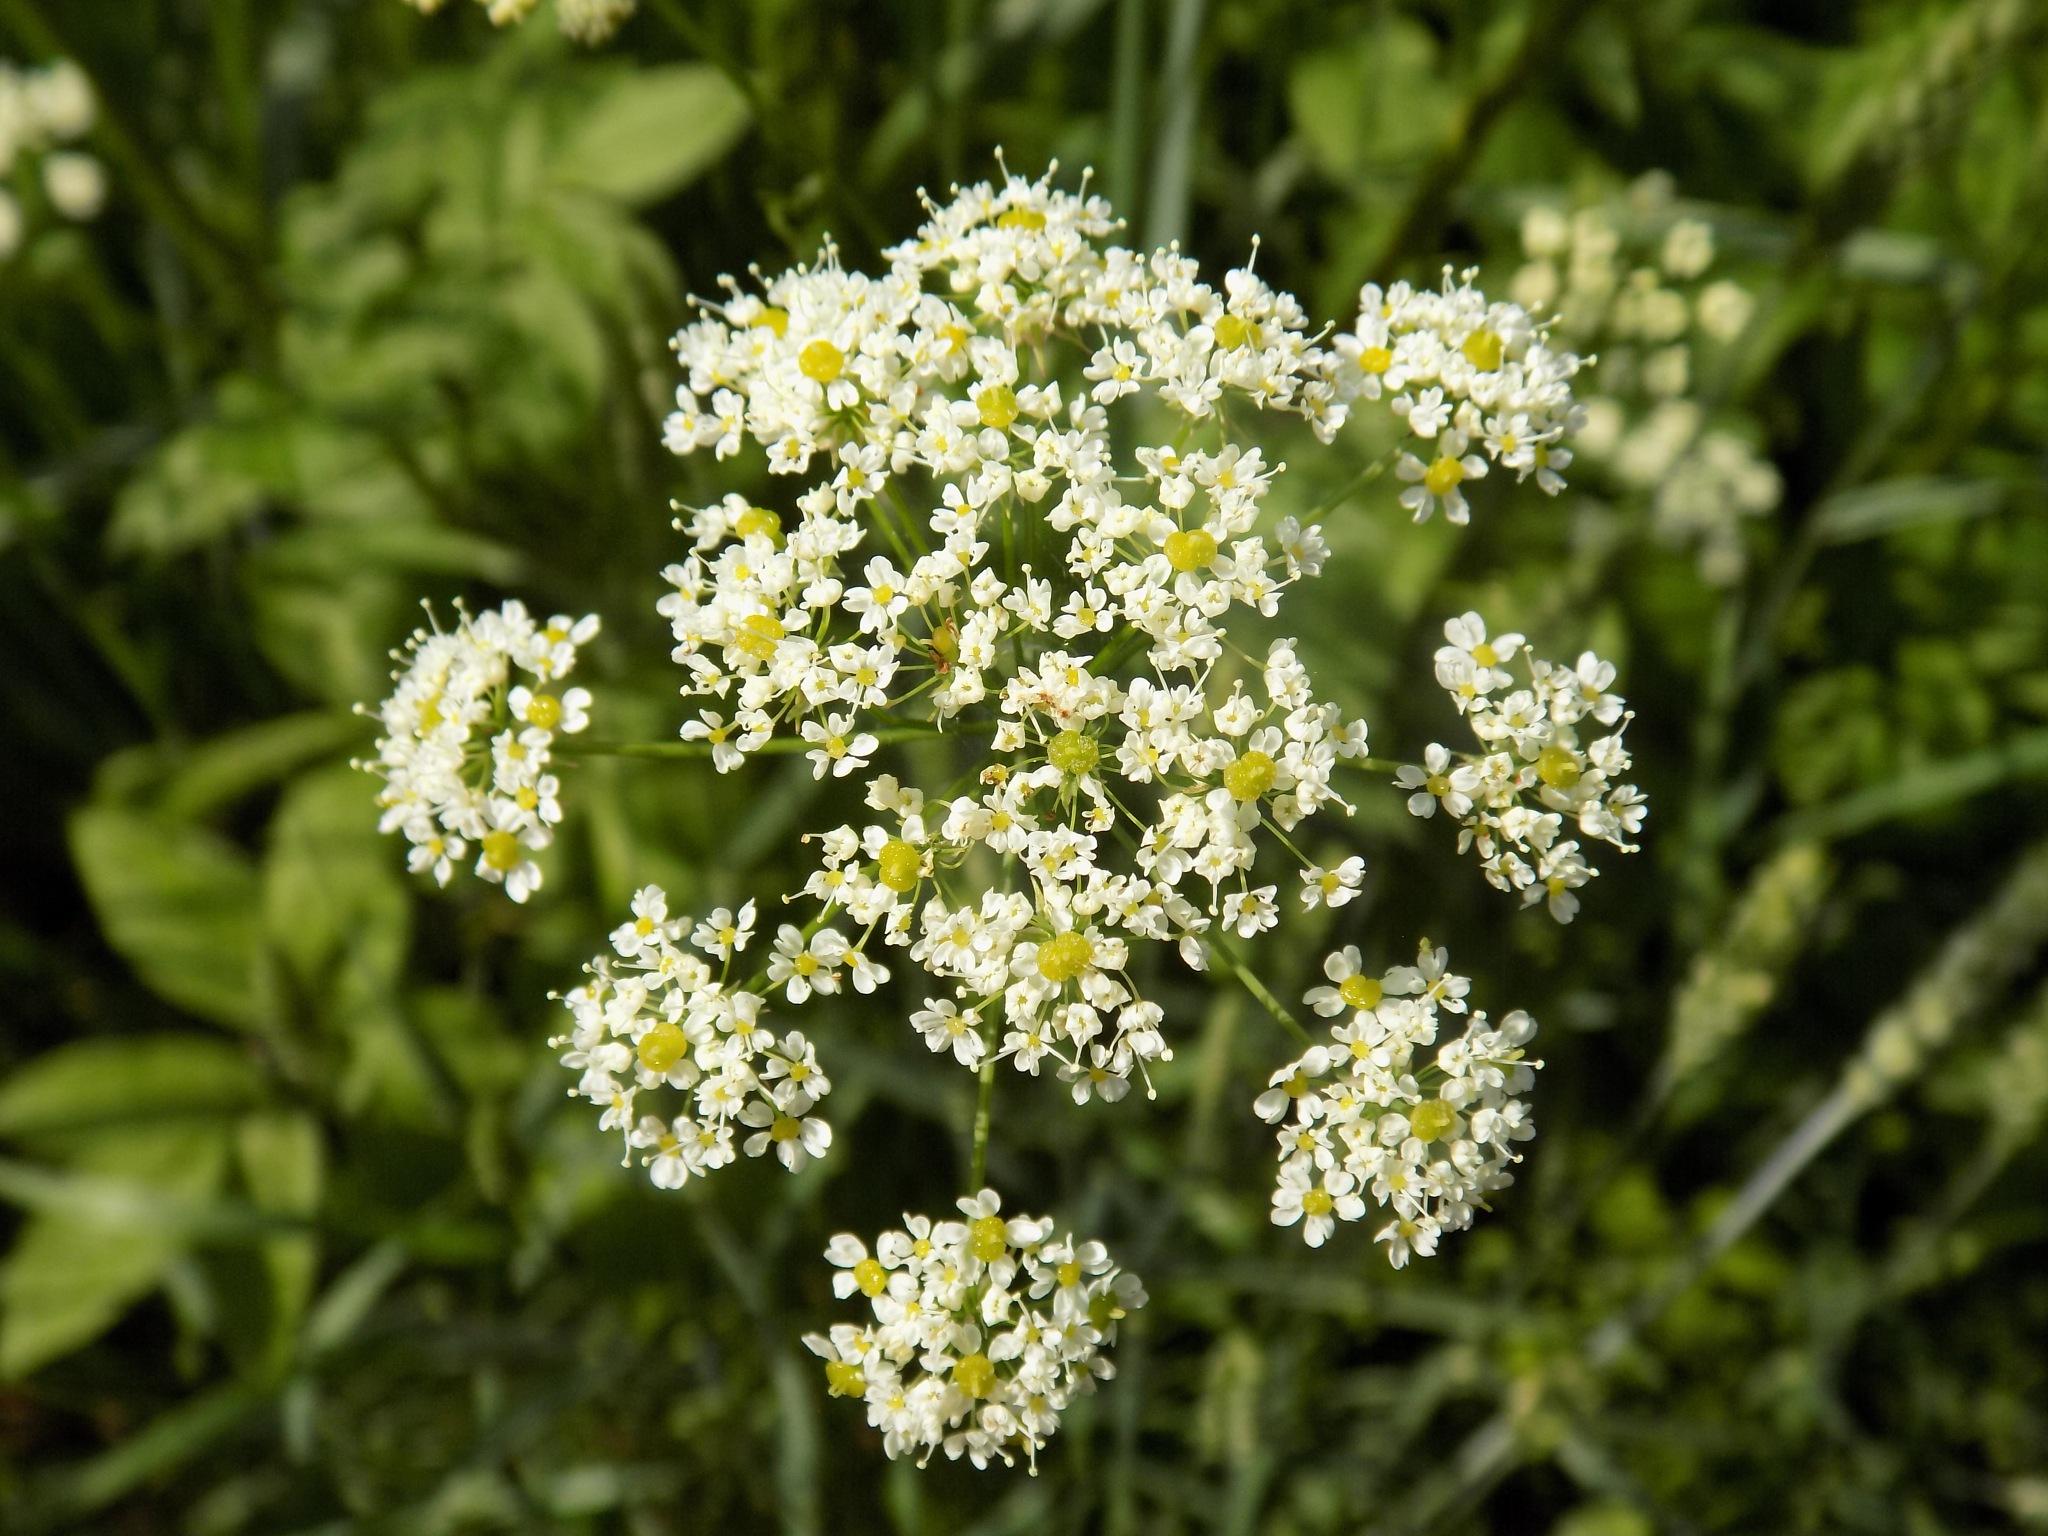 Wild plant by uzkuraitiene62